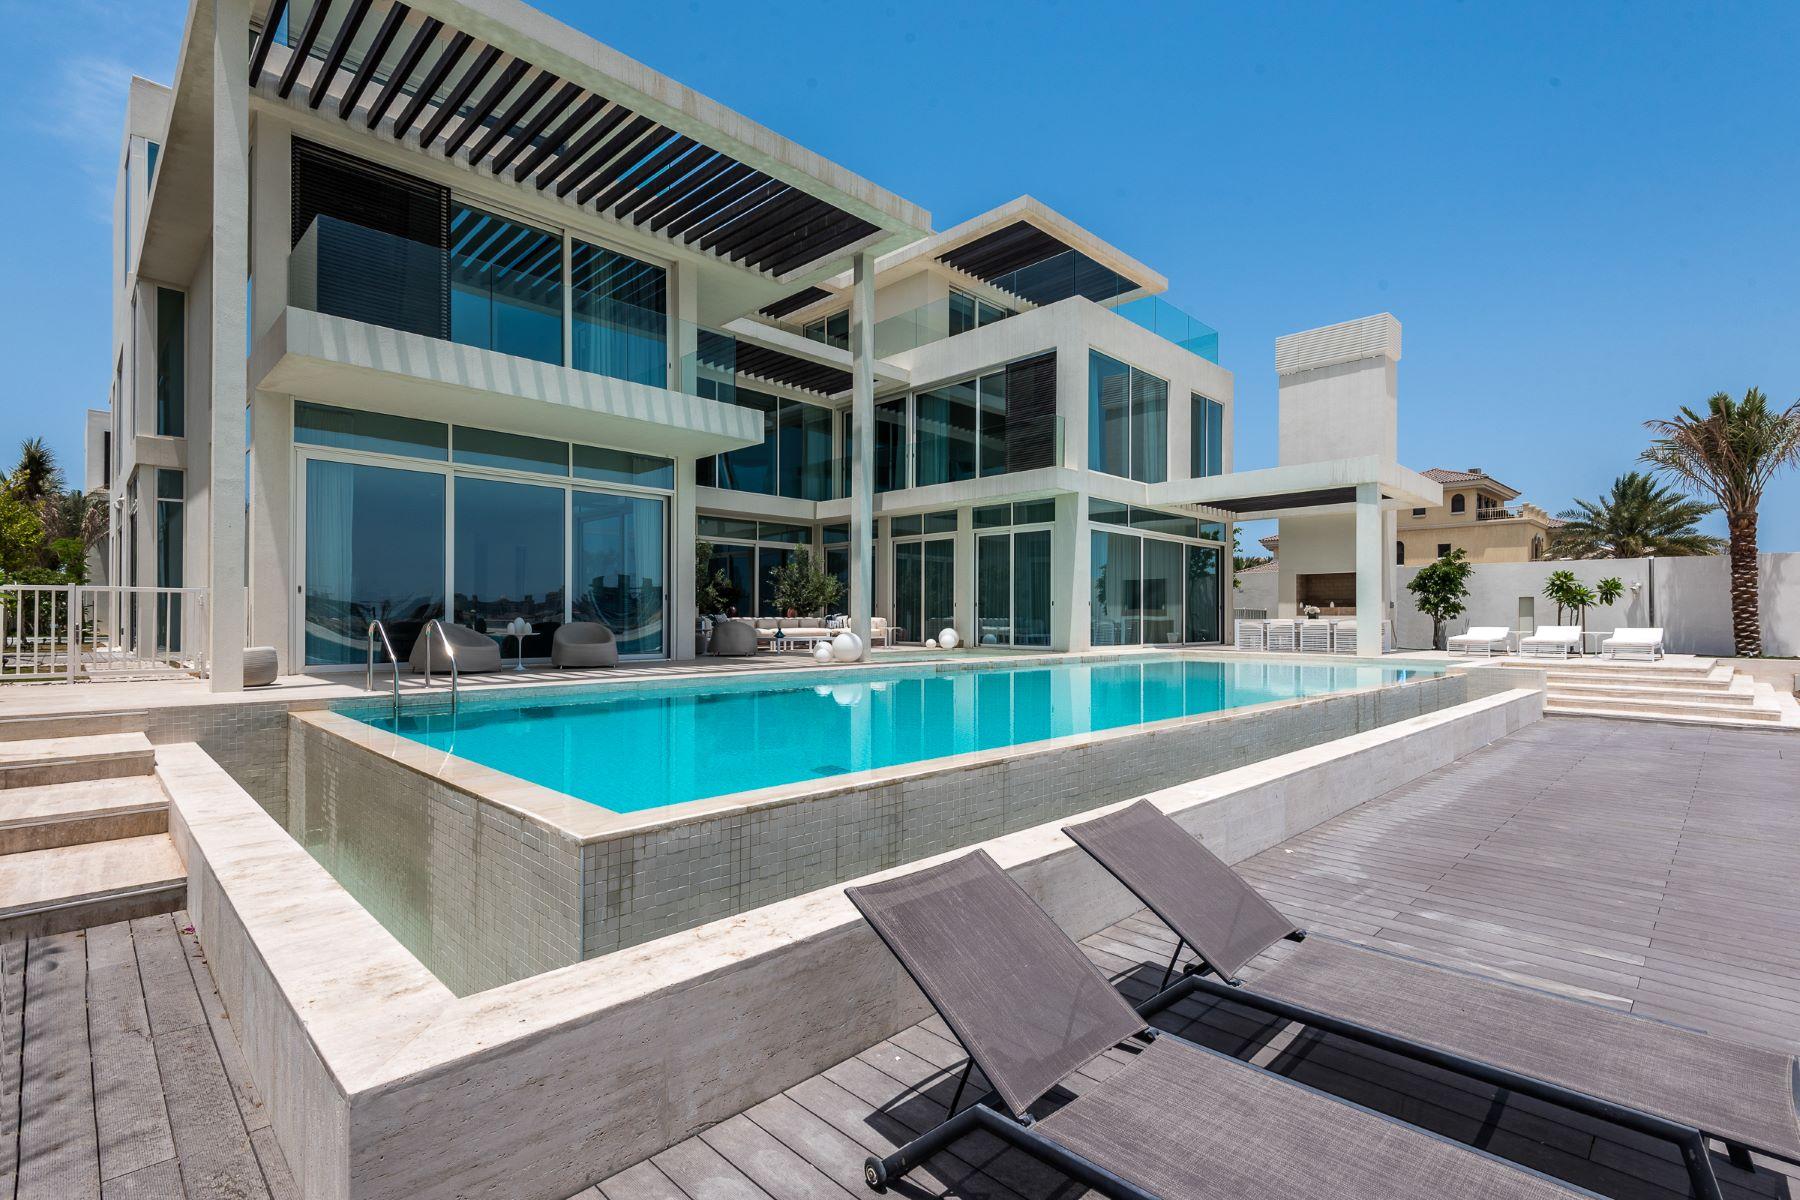 Single Family Home for Sale at Luxury Modern Tip Villa Palm Jumeriah, Dubai, Dubai United Arab Emirates